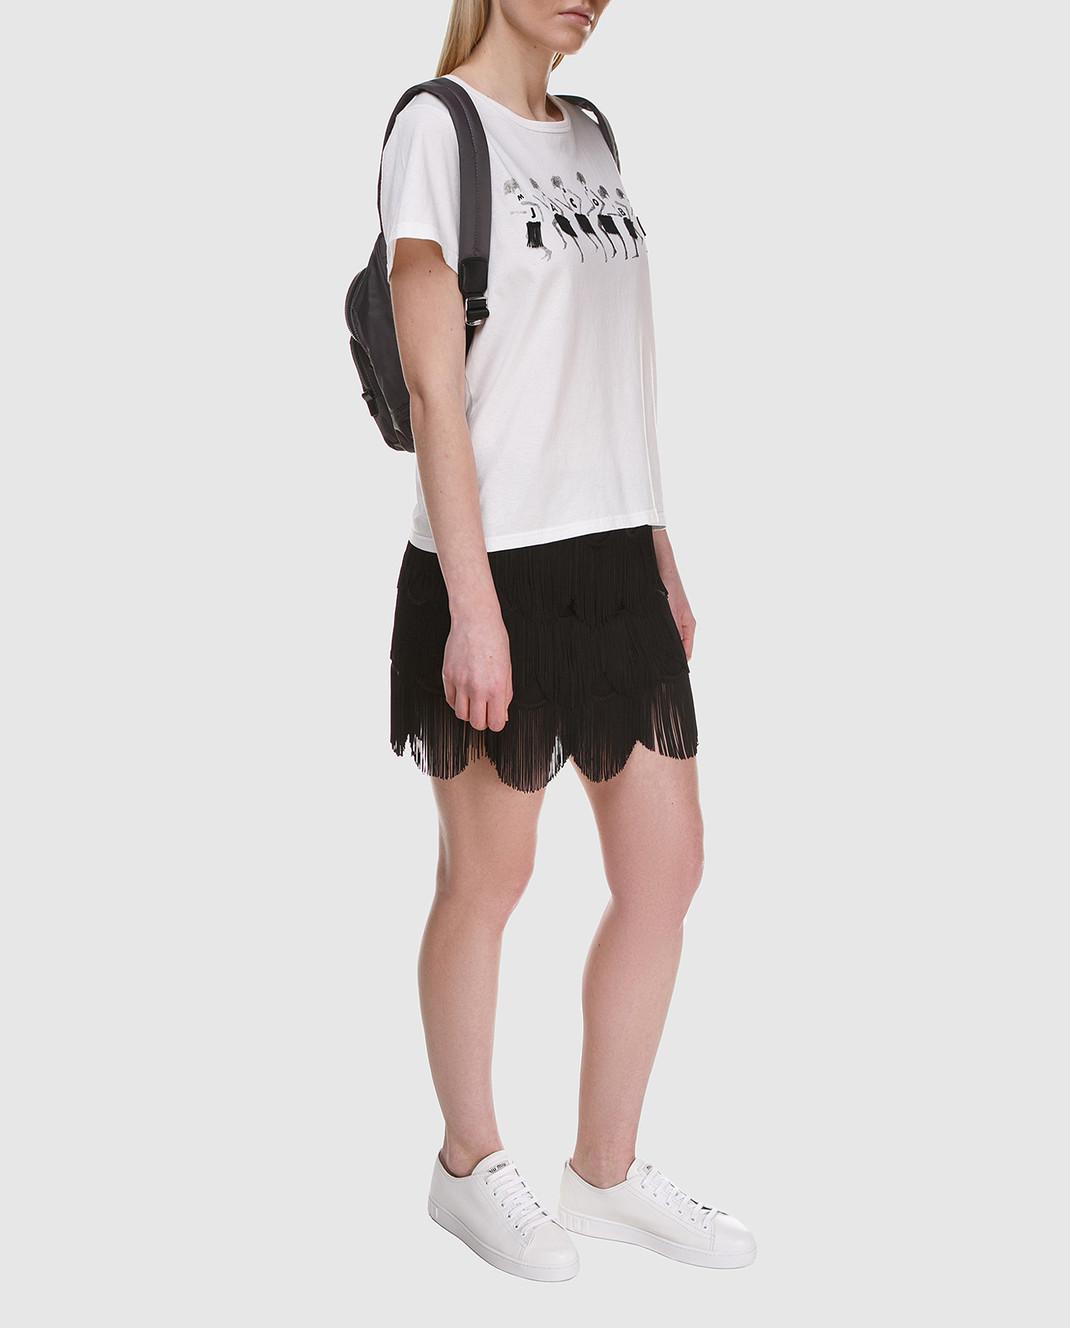 Marc Jacobs Черная юбка с бахромой M4007161 изображение 2